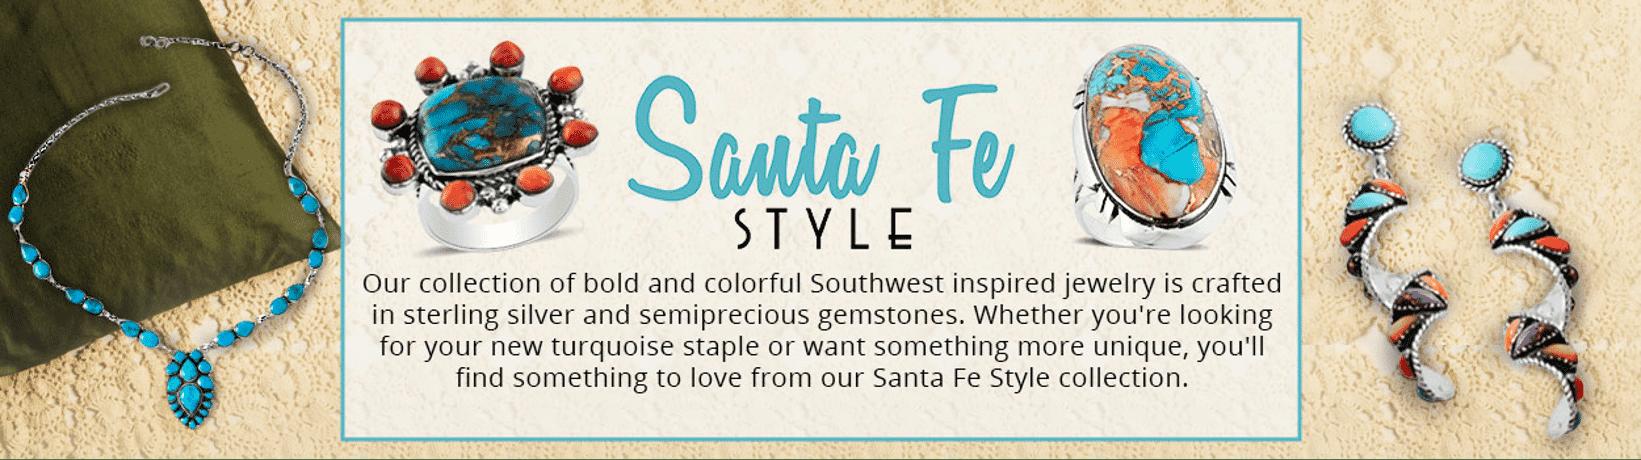 Santa Fe Style Banner